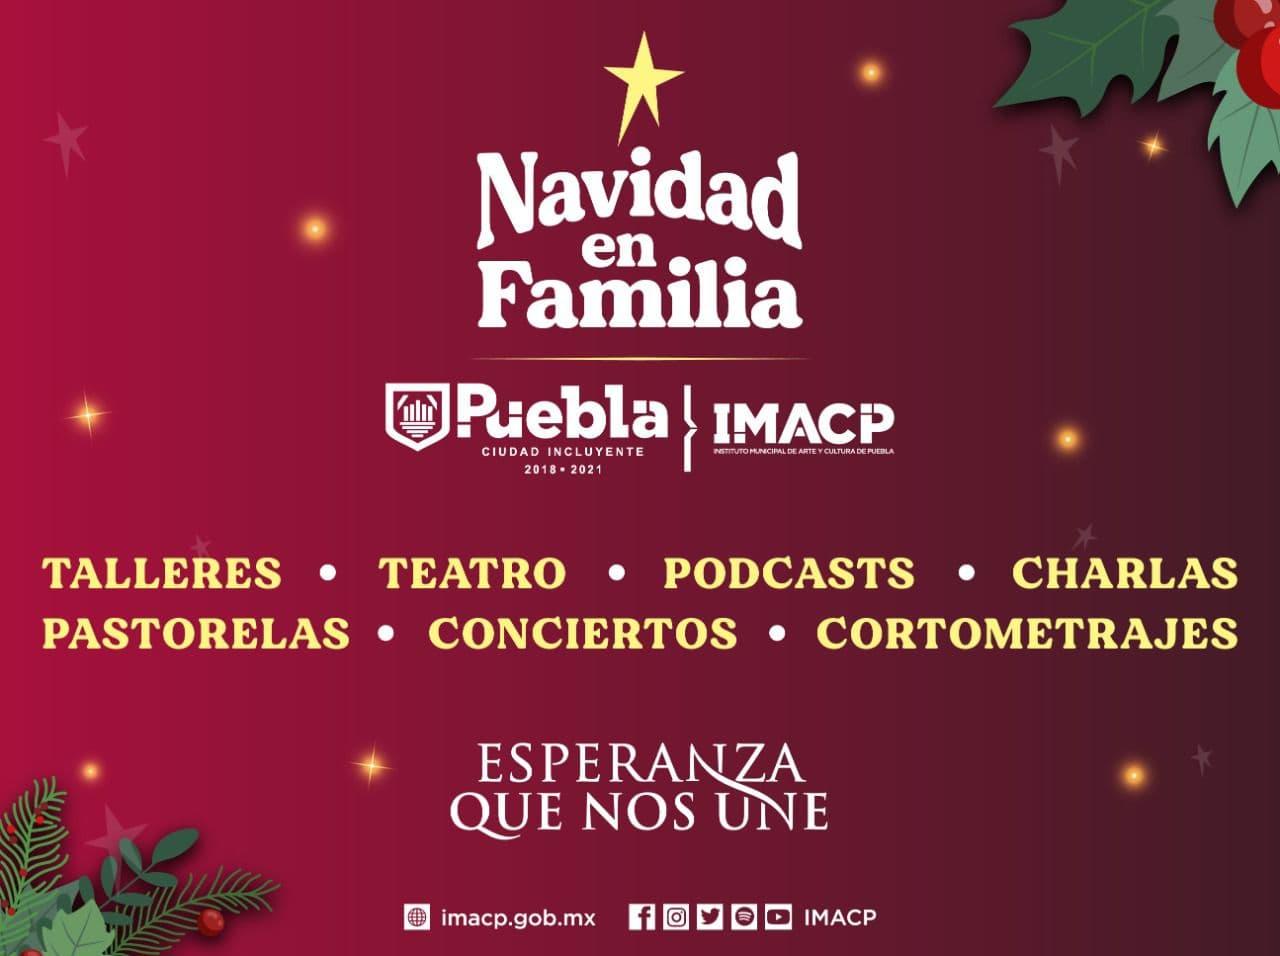 IMACP presenta cartelera de actividades para la temporada navideña